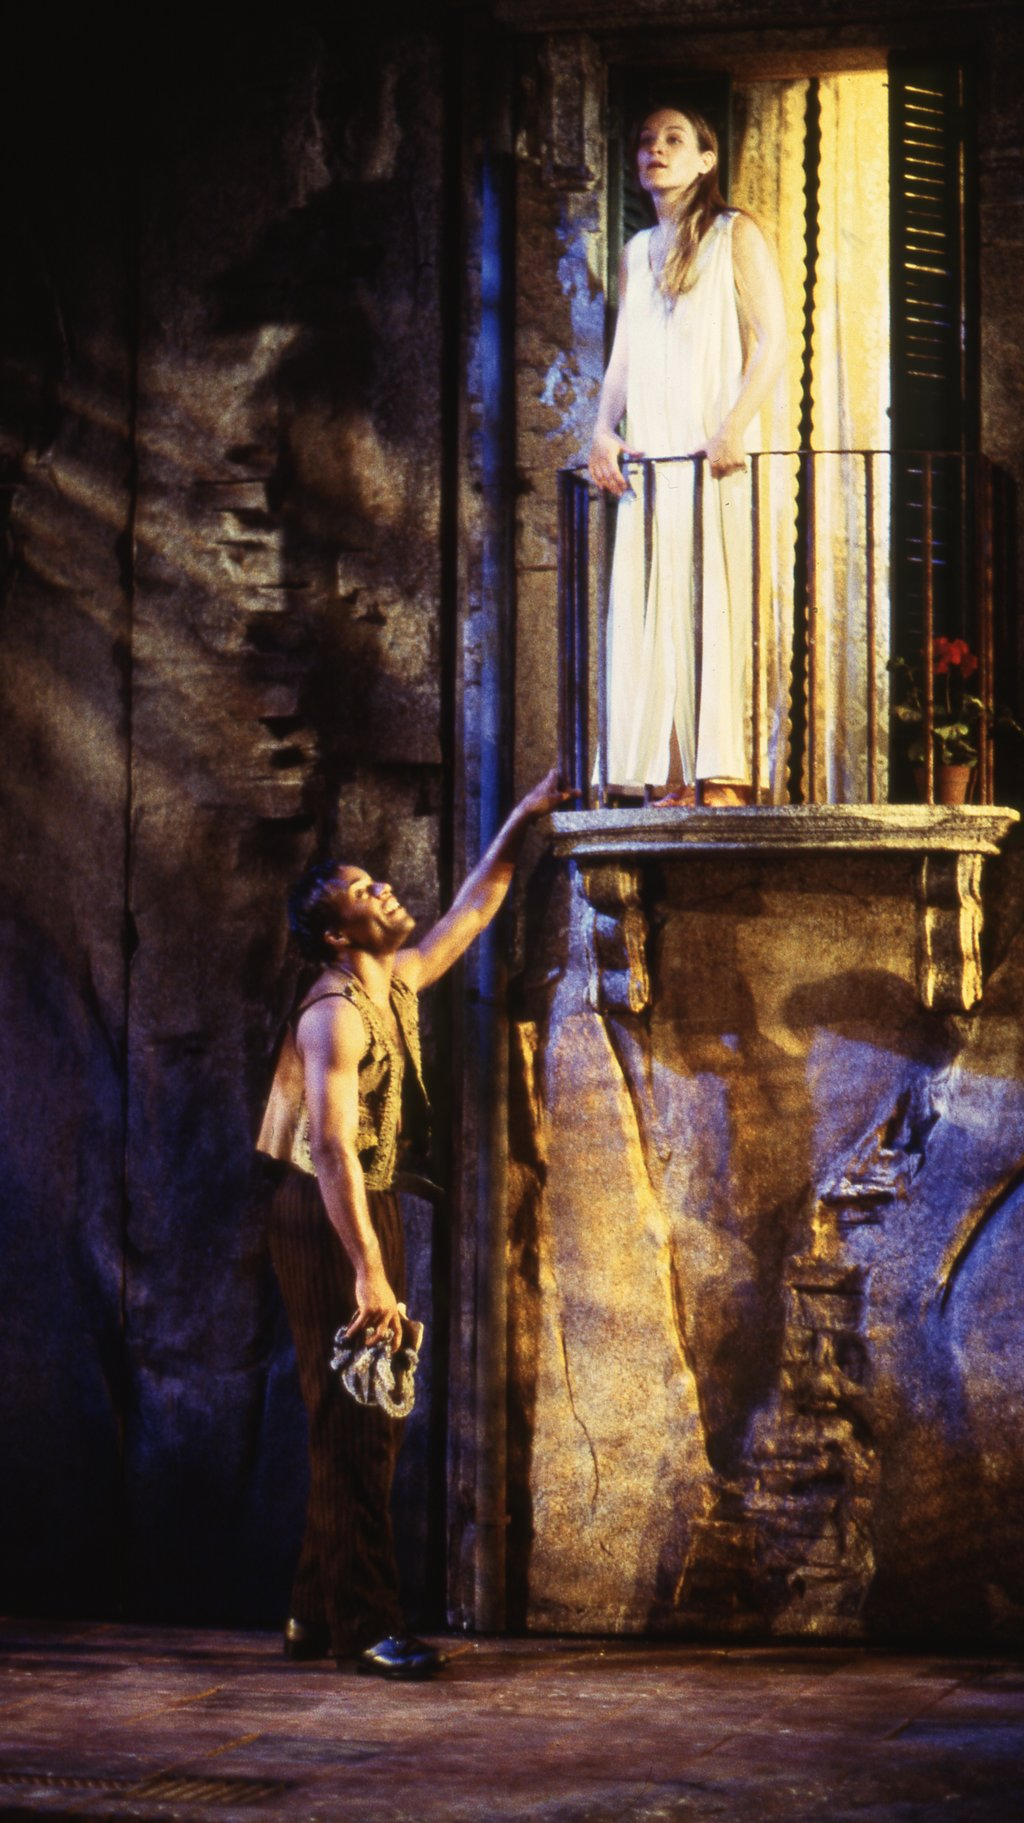 Romeo and Juliet in the Balcony Scene.